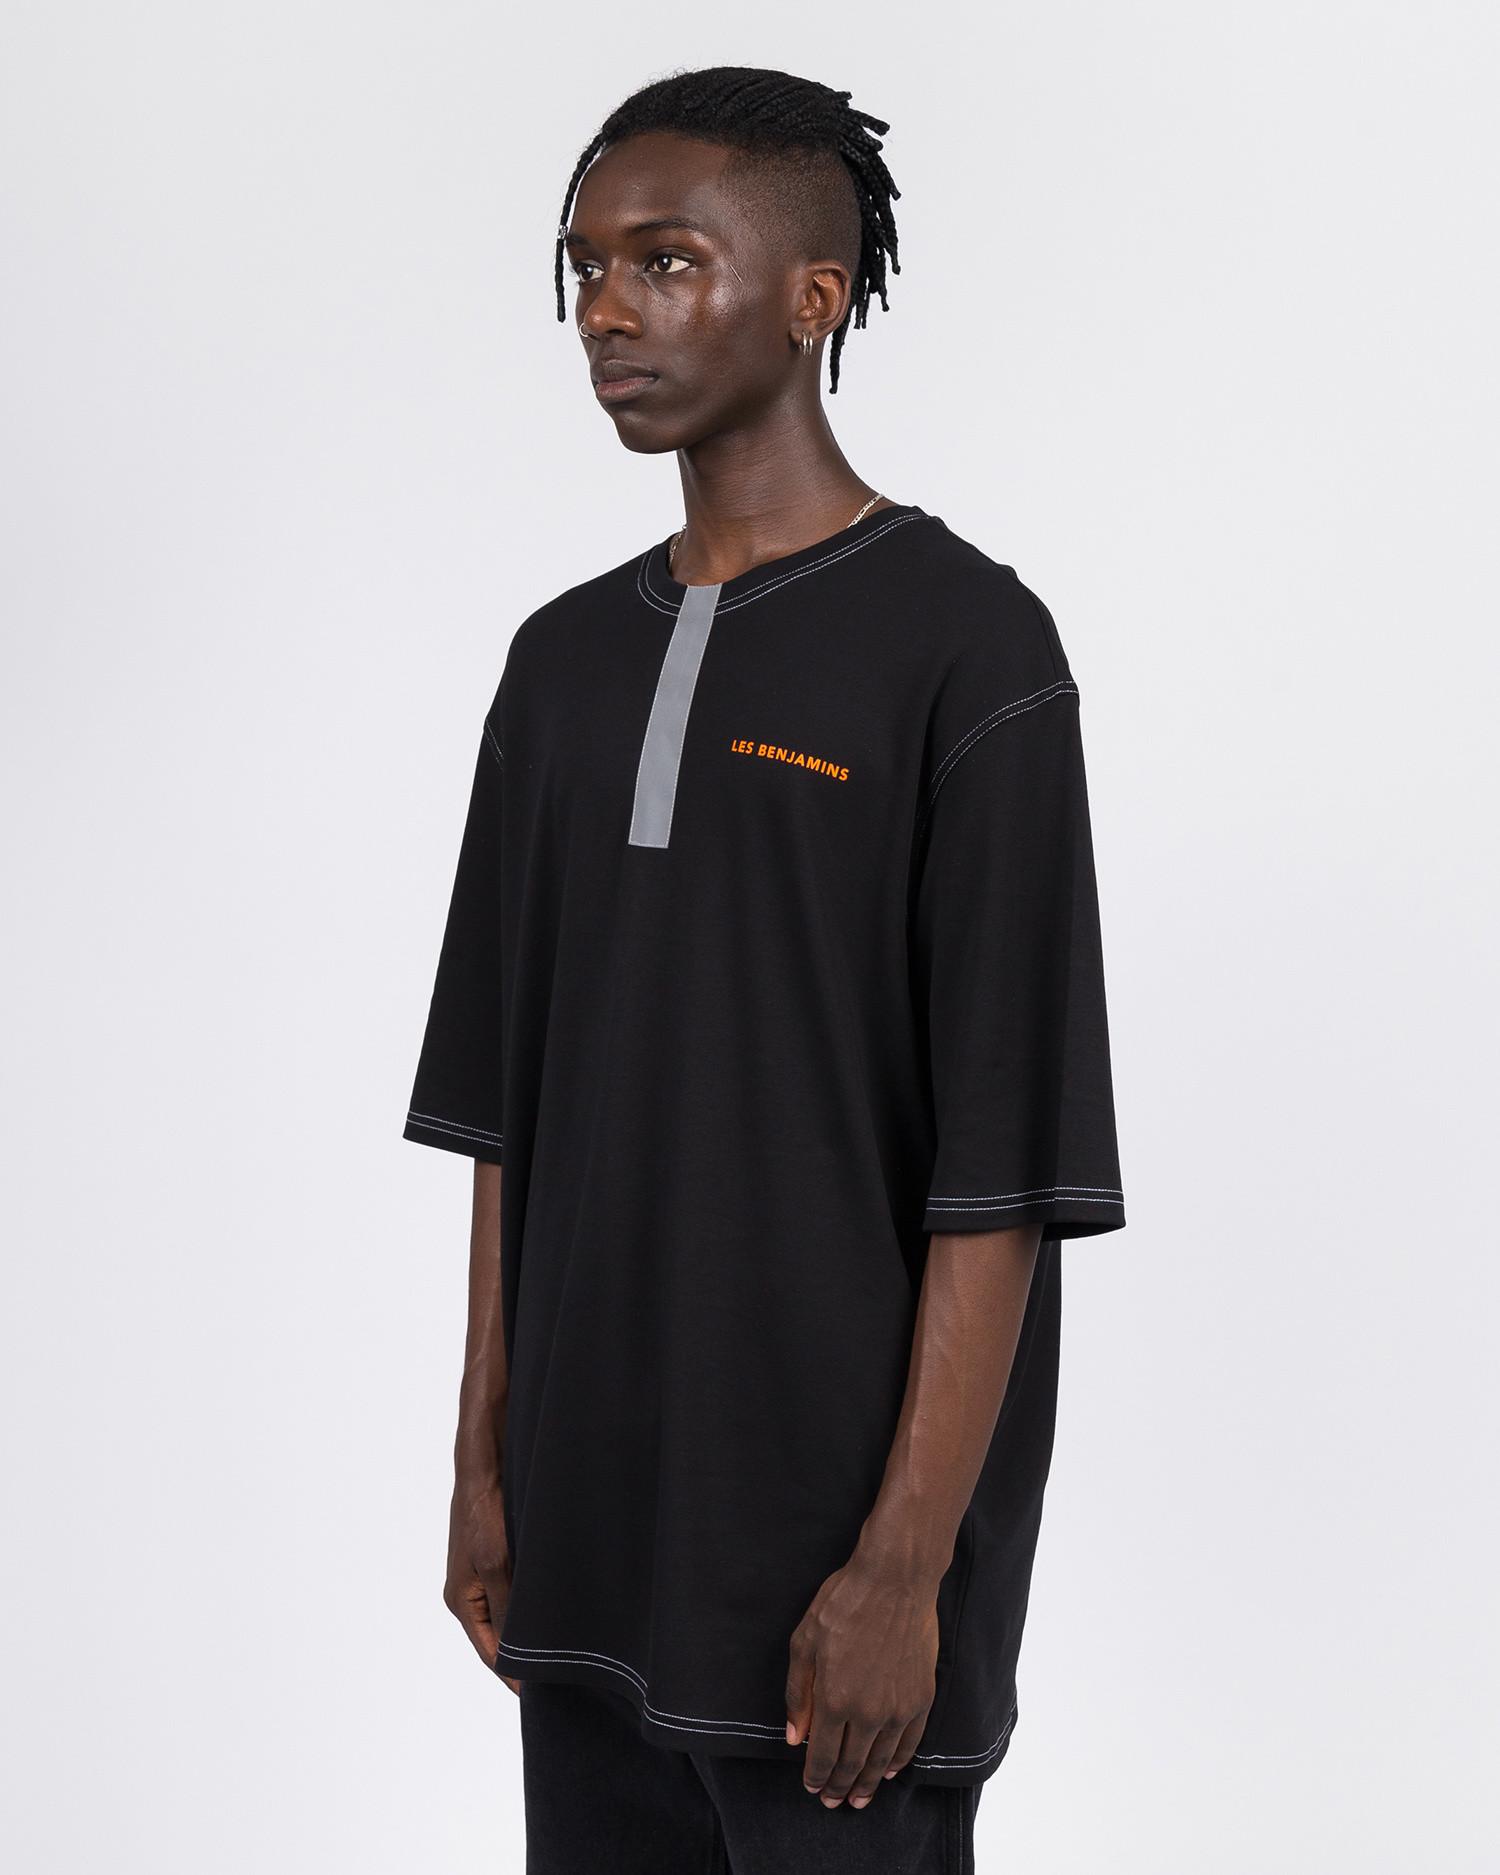 Les Benjamins Oversize Short Sleeve Tee Black